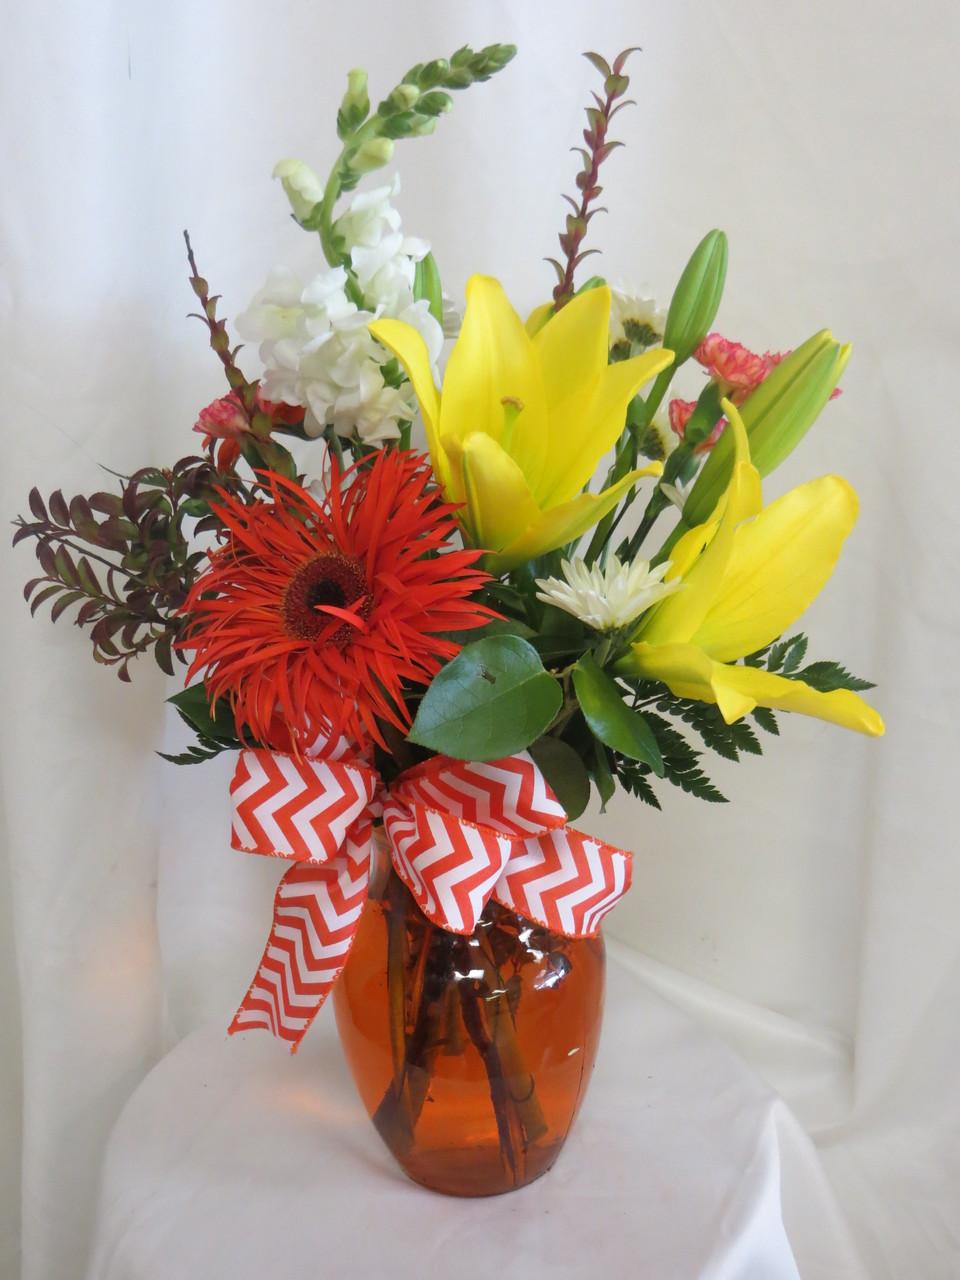 Sunny Sunshine Orange Gerbera And Yellow Lily Flower Arrangement